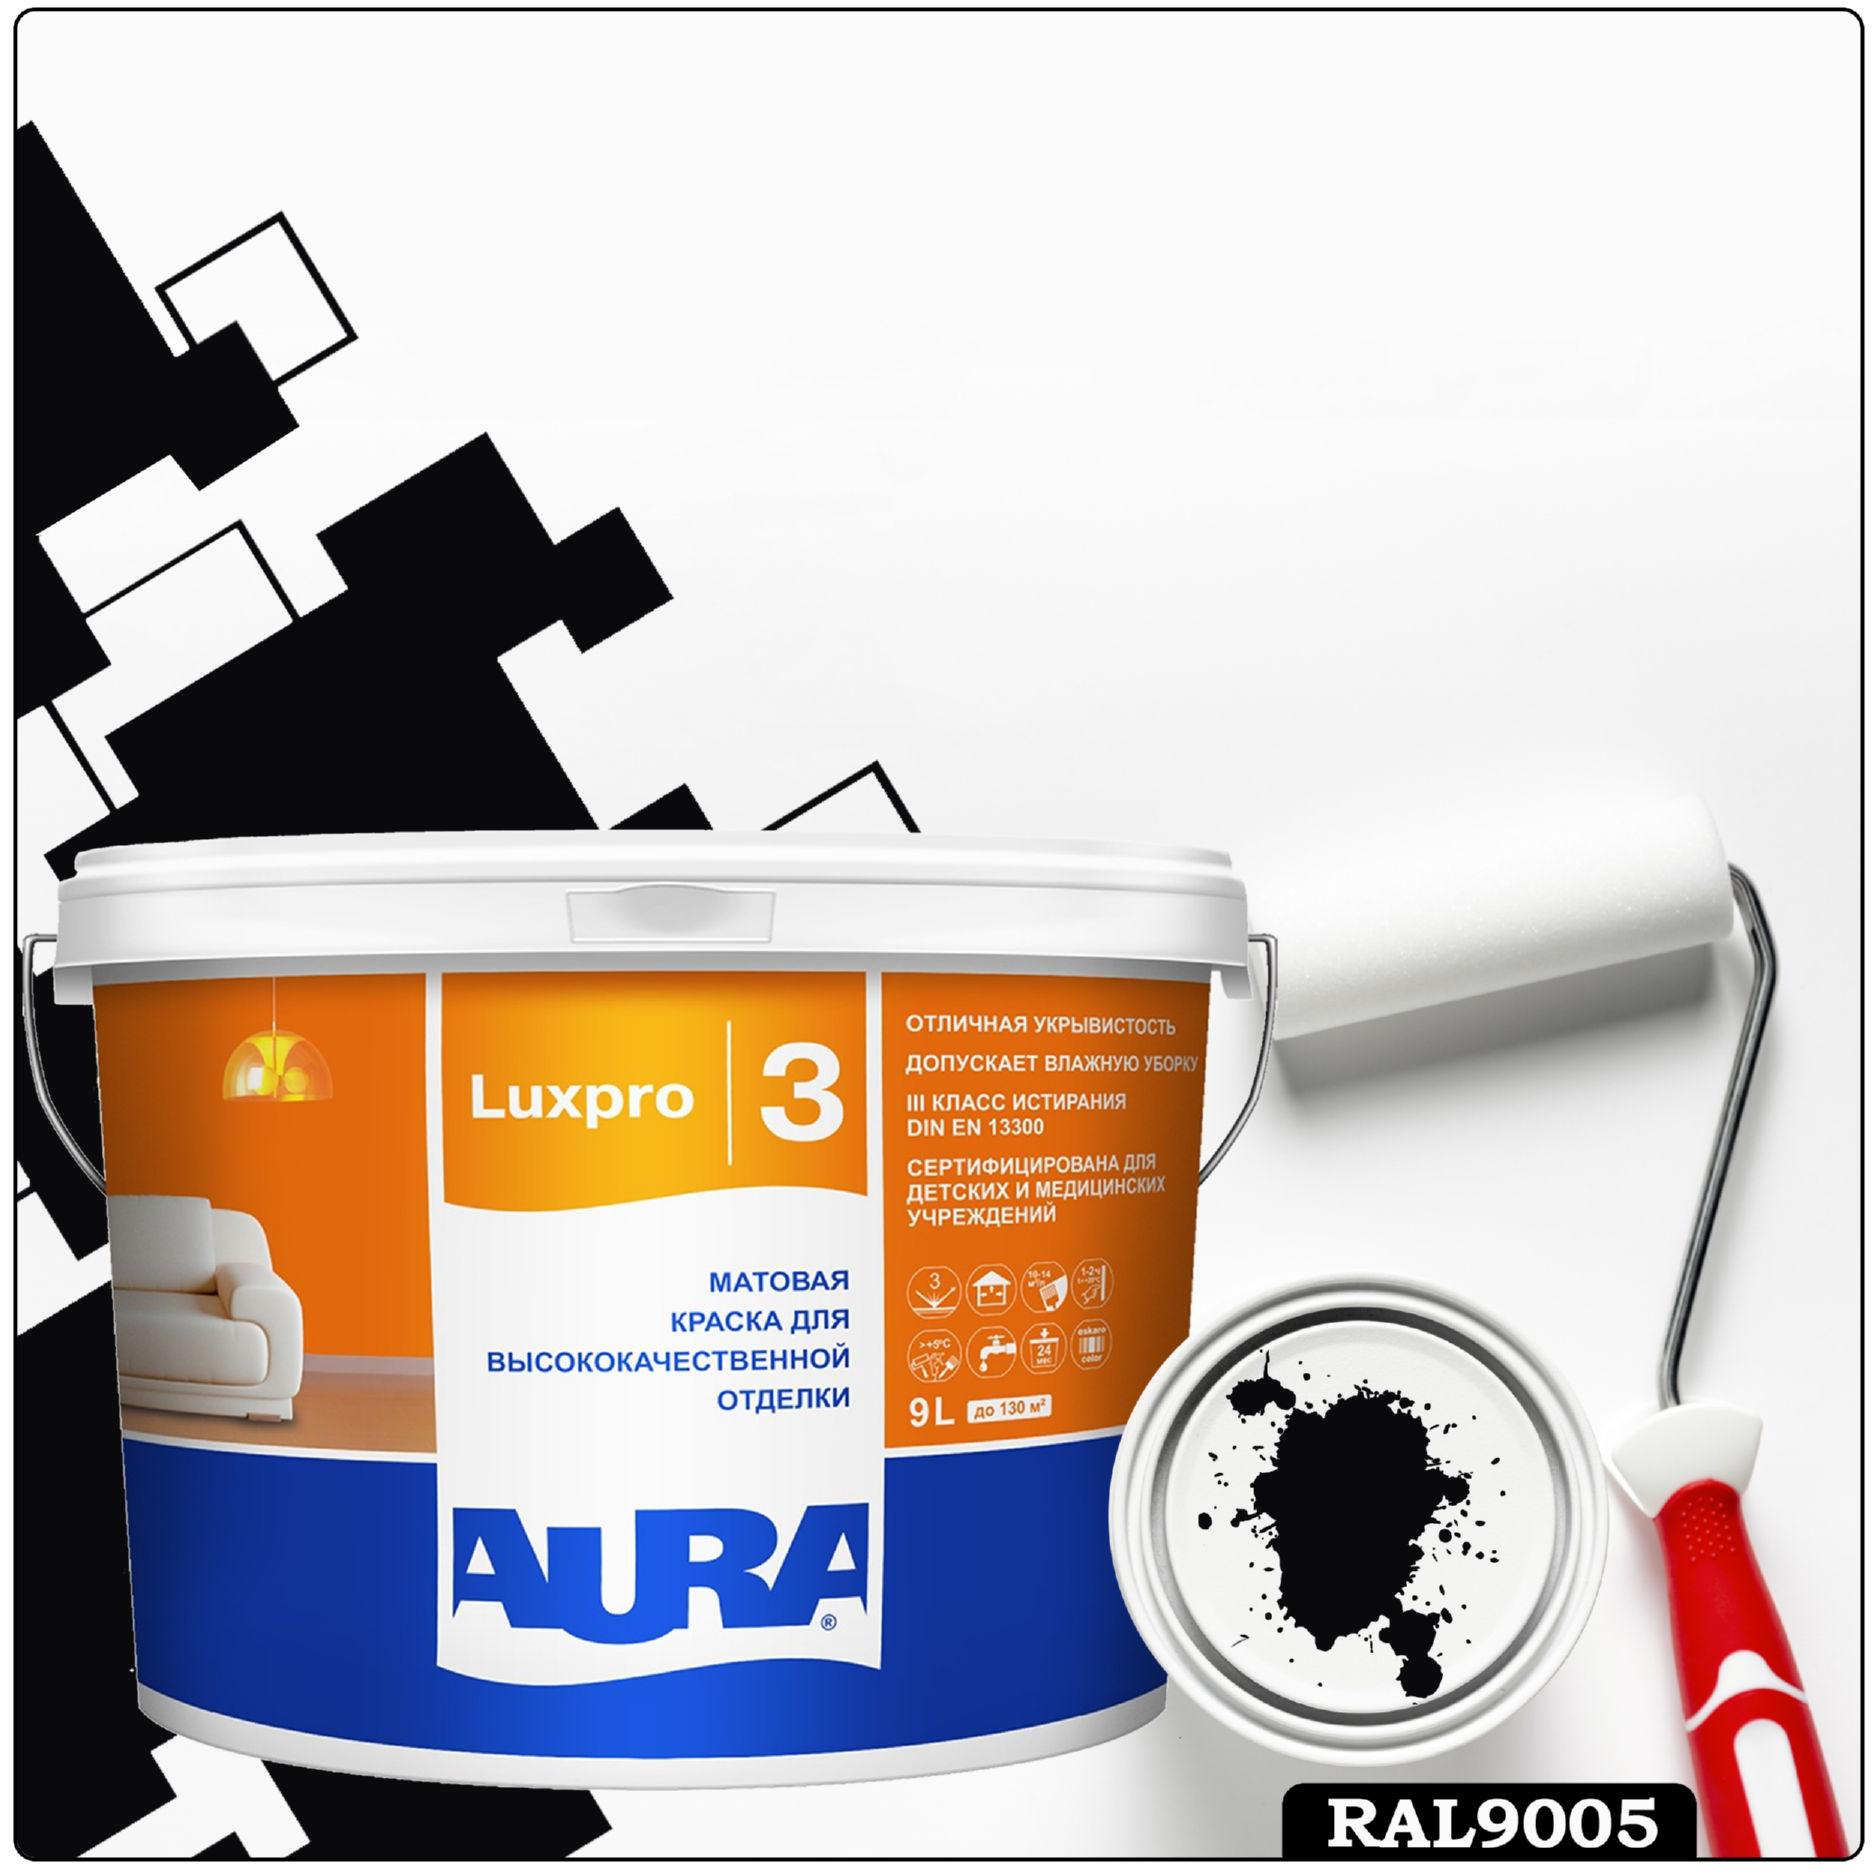 Фото 5 - Краска Aura LuxPRO 3, RAL 9005 Черный янтарь, латексная, шелково-матовая, интерьерная, 9л, Аура.